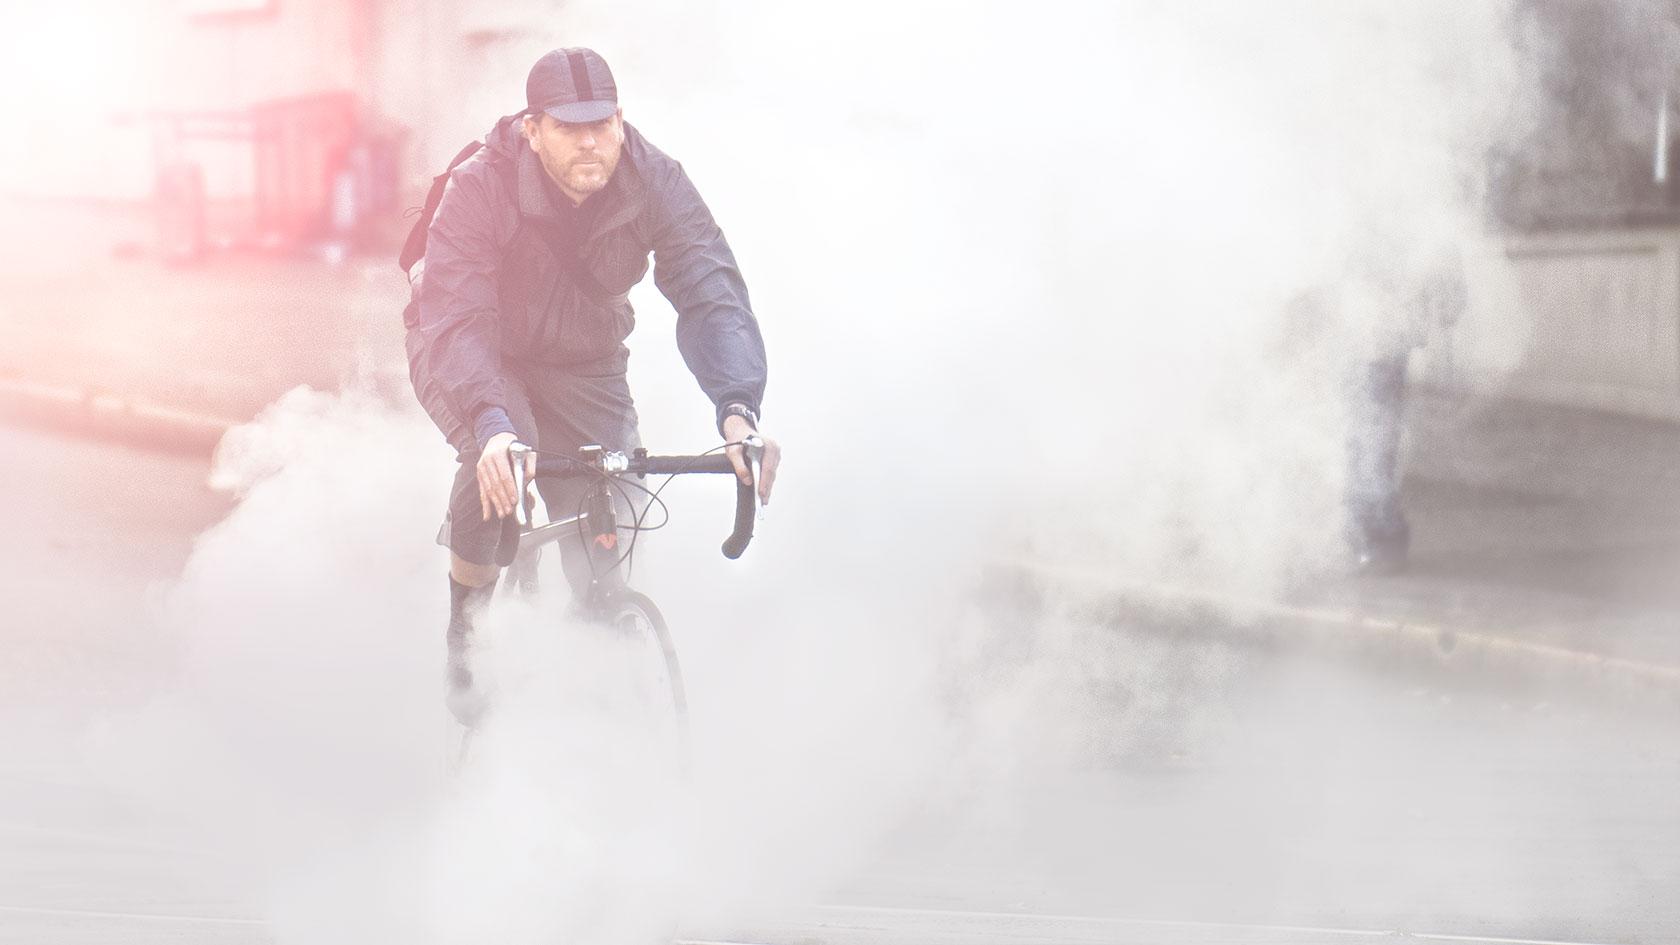 austin-trigg-seattle-bicycle-company-lifestyle-Smoke-Ride-street-downtown.jpg